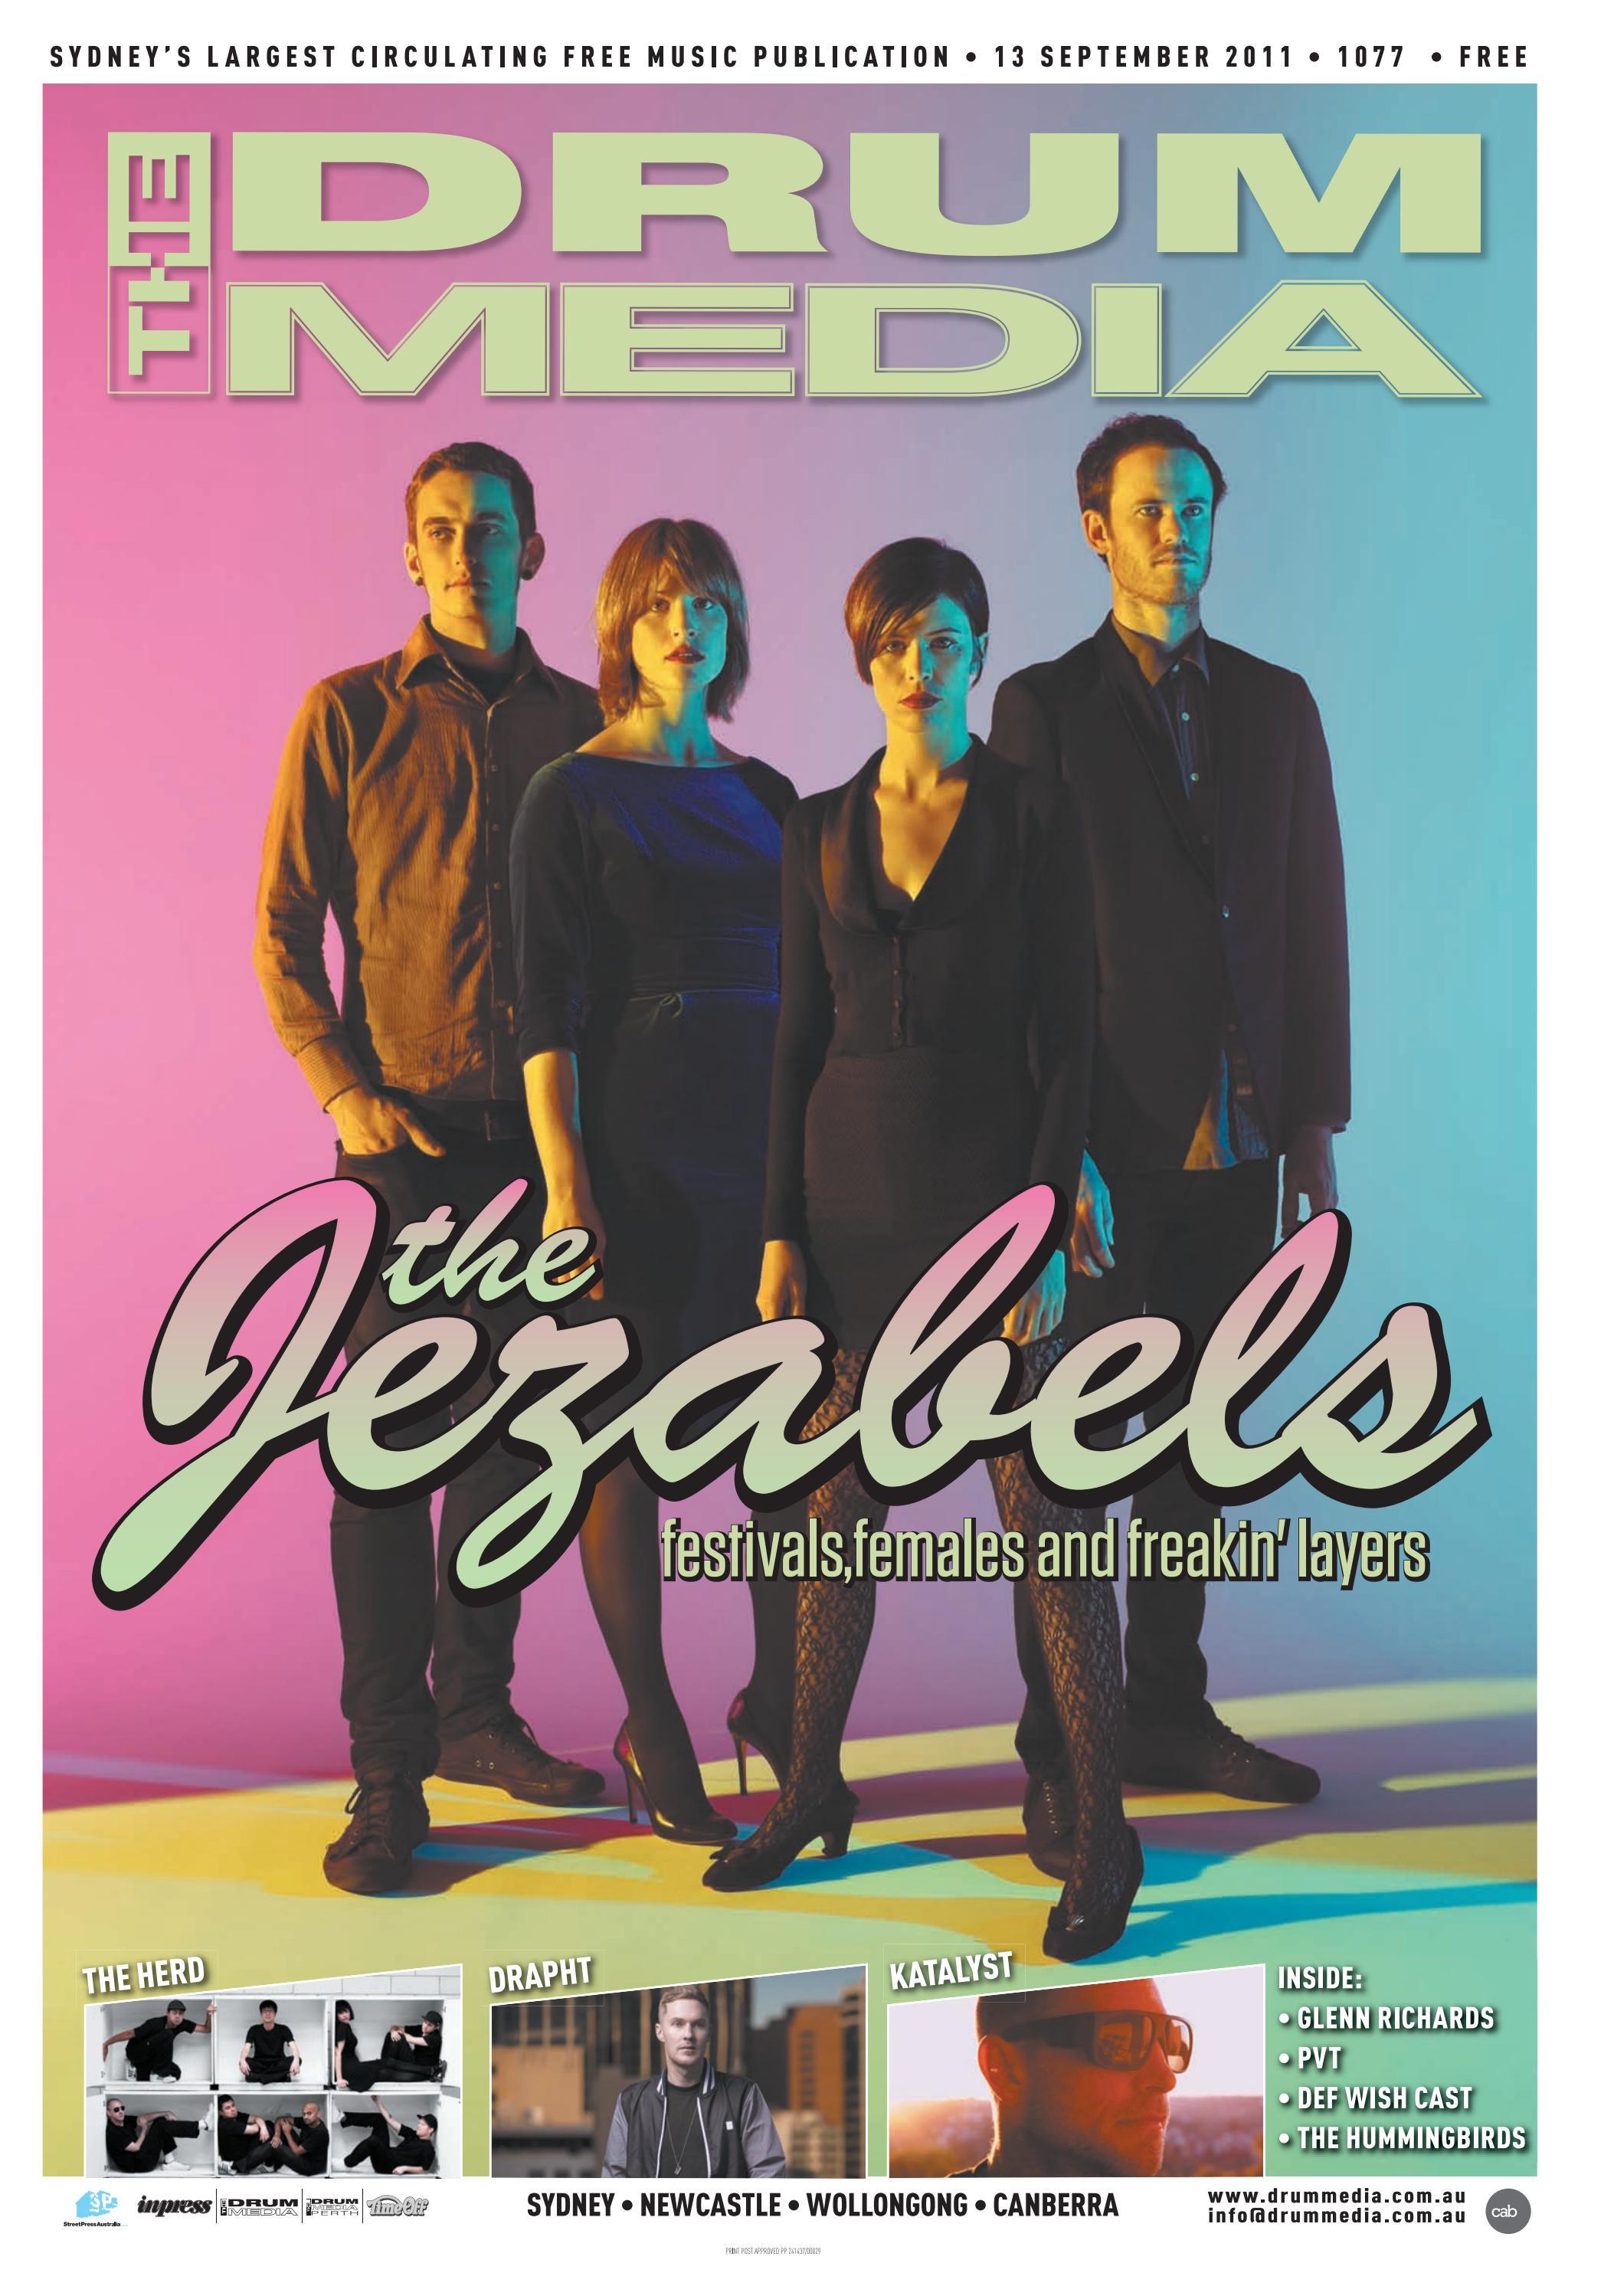 Drum Media Sydney Issue #1077 by TheMusic com au - issuu